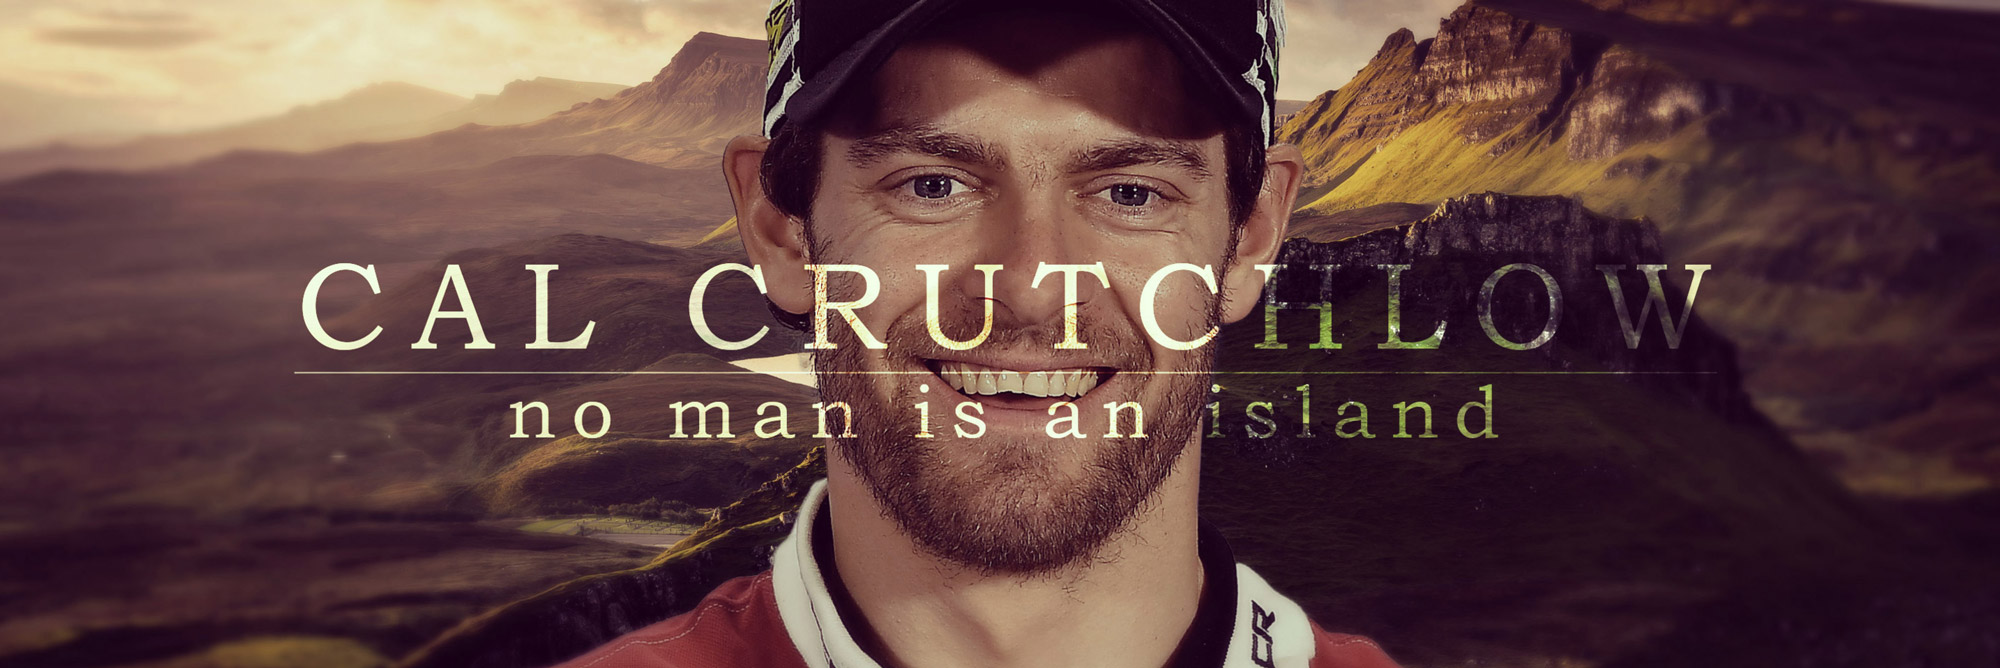 Cal Crutchlow No Man is an Island